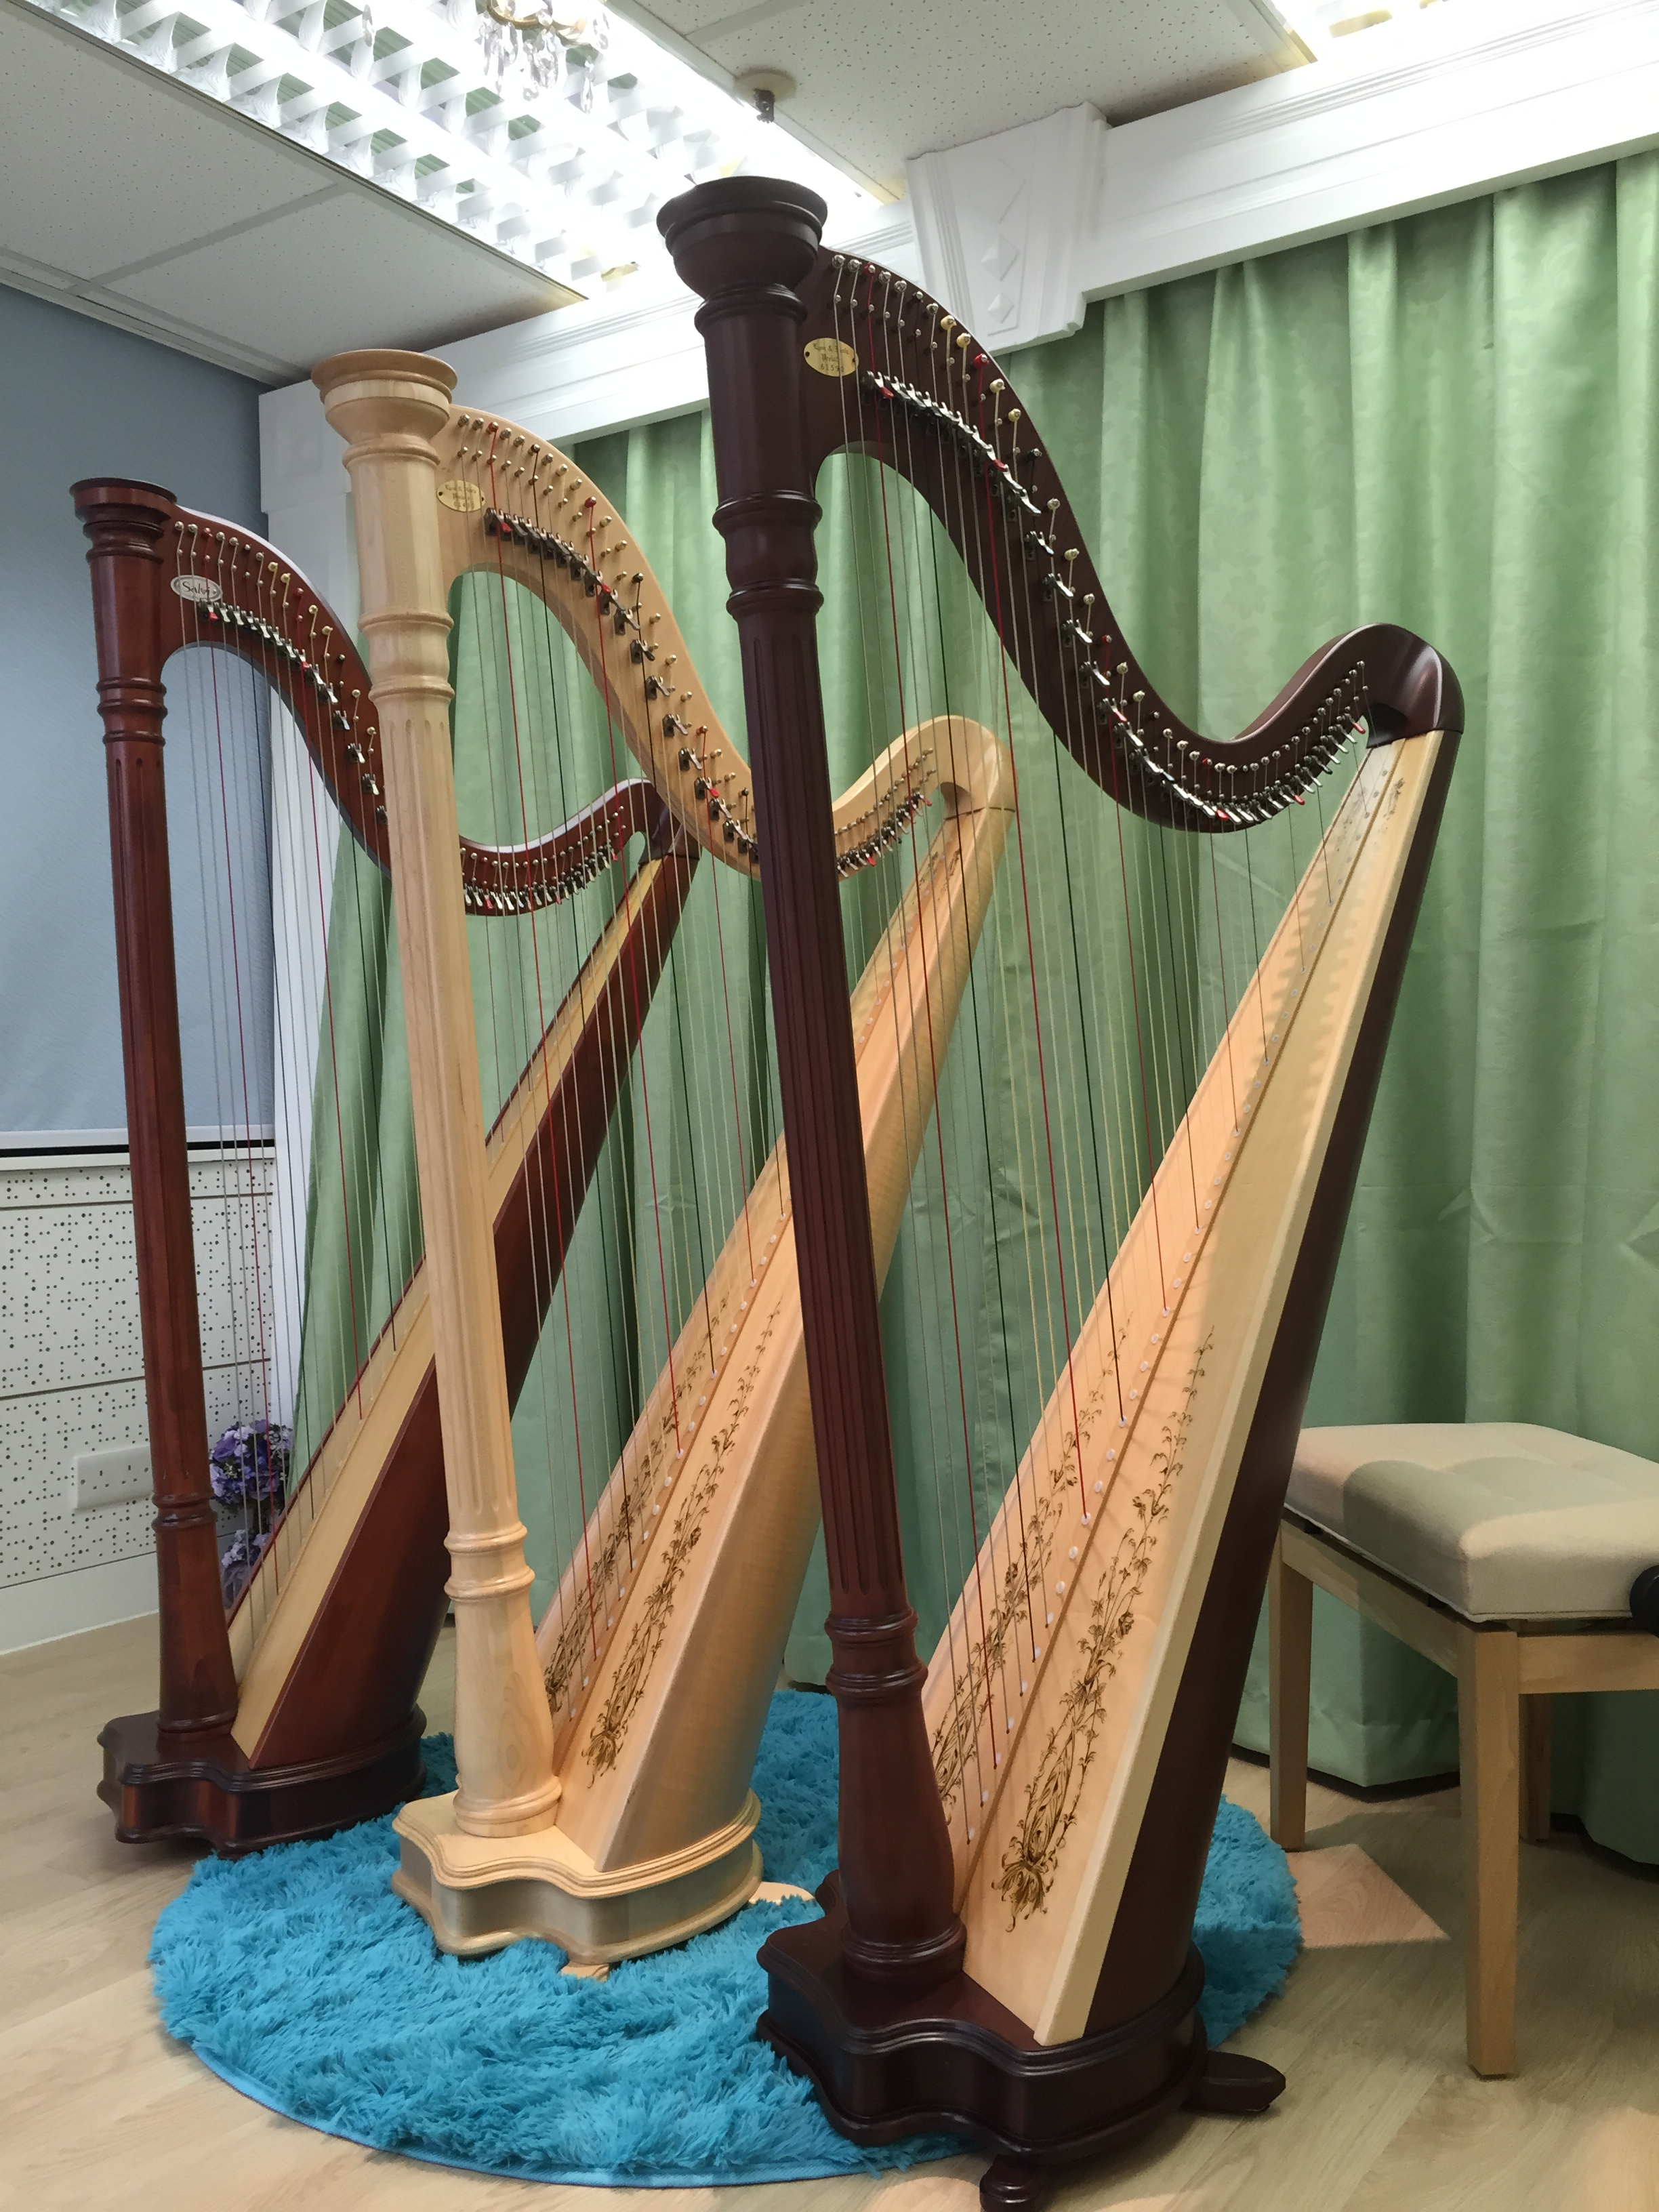 Harp Group Class 豎琴小組課程 – Harmonie Harp Music 香港豎琴藝術中心